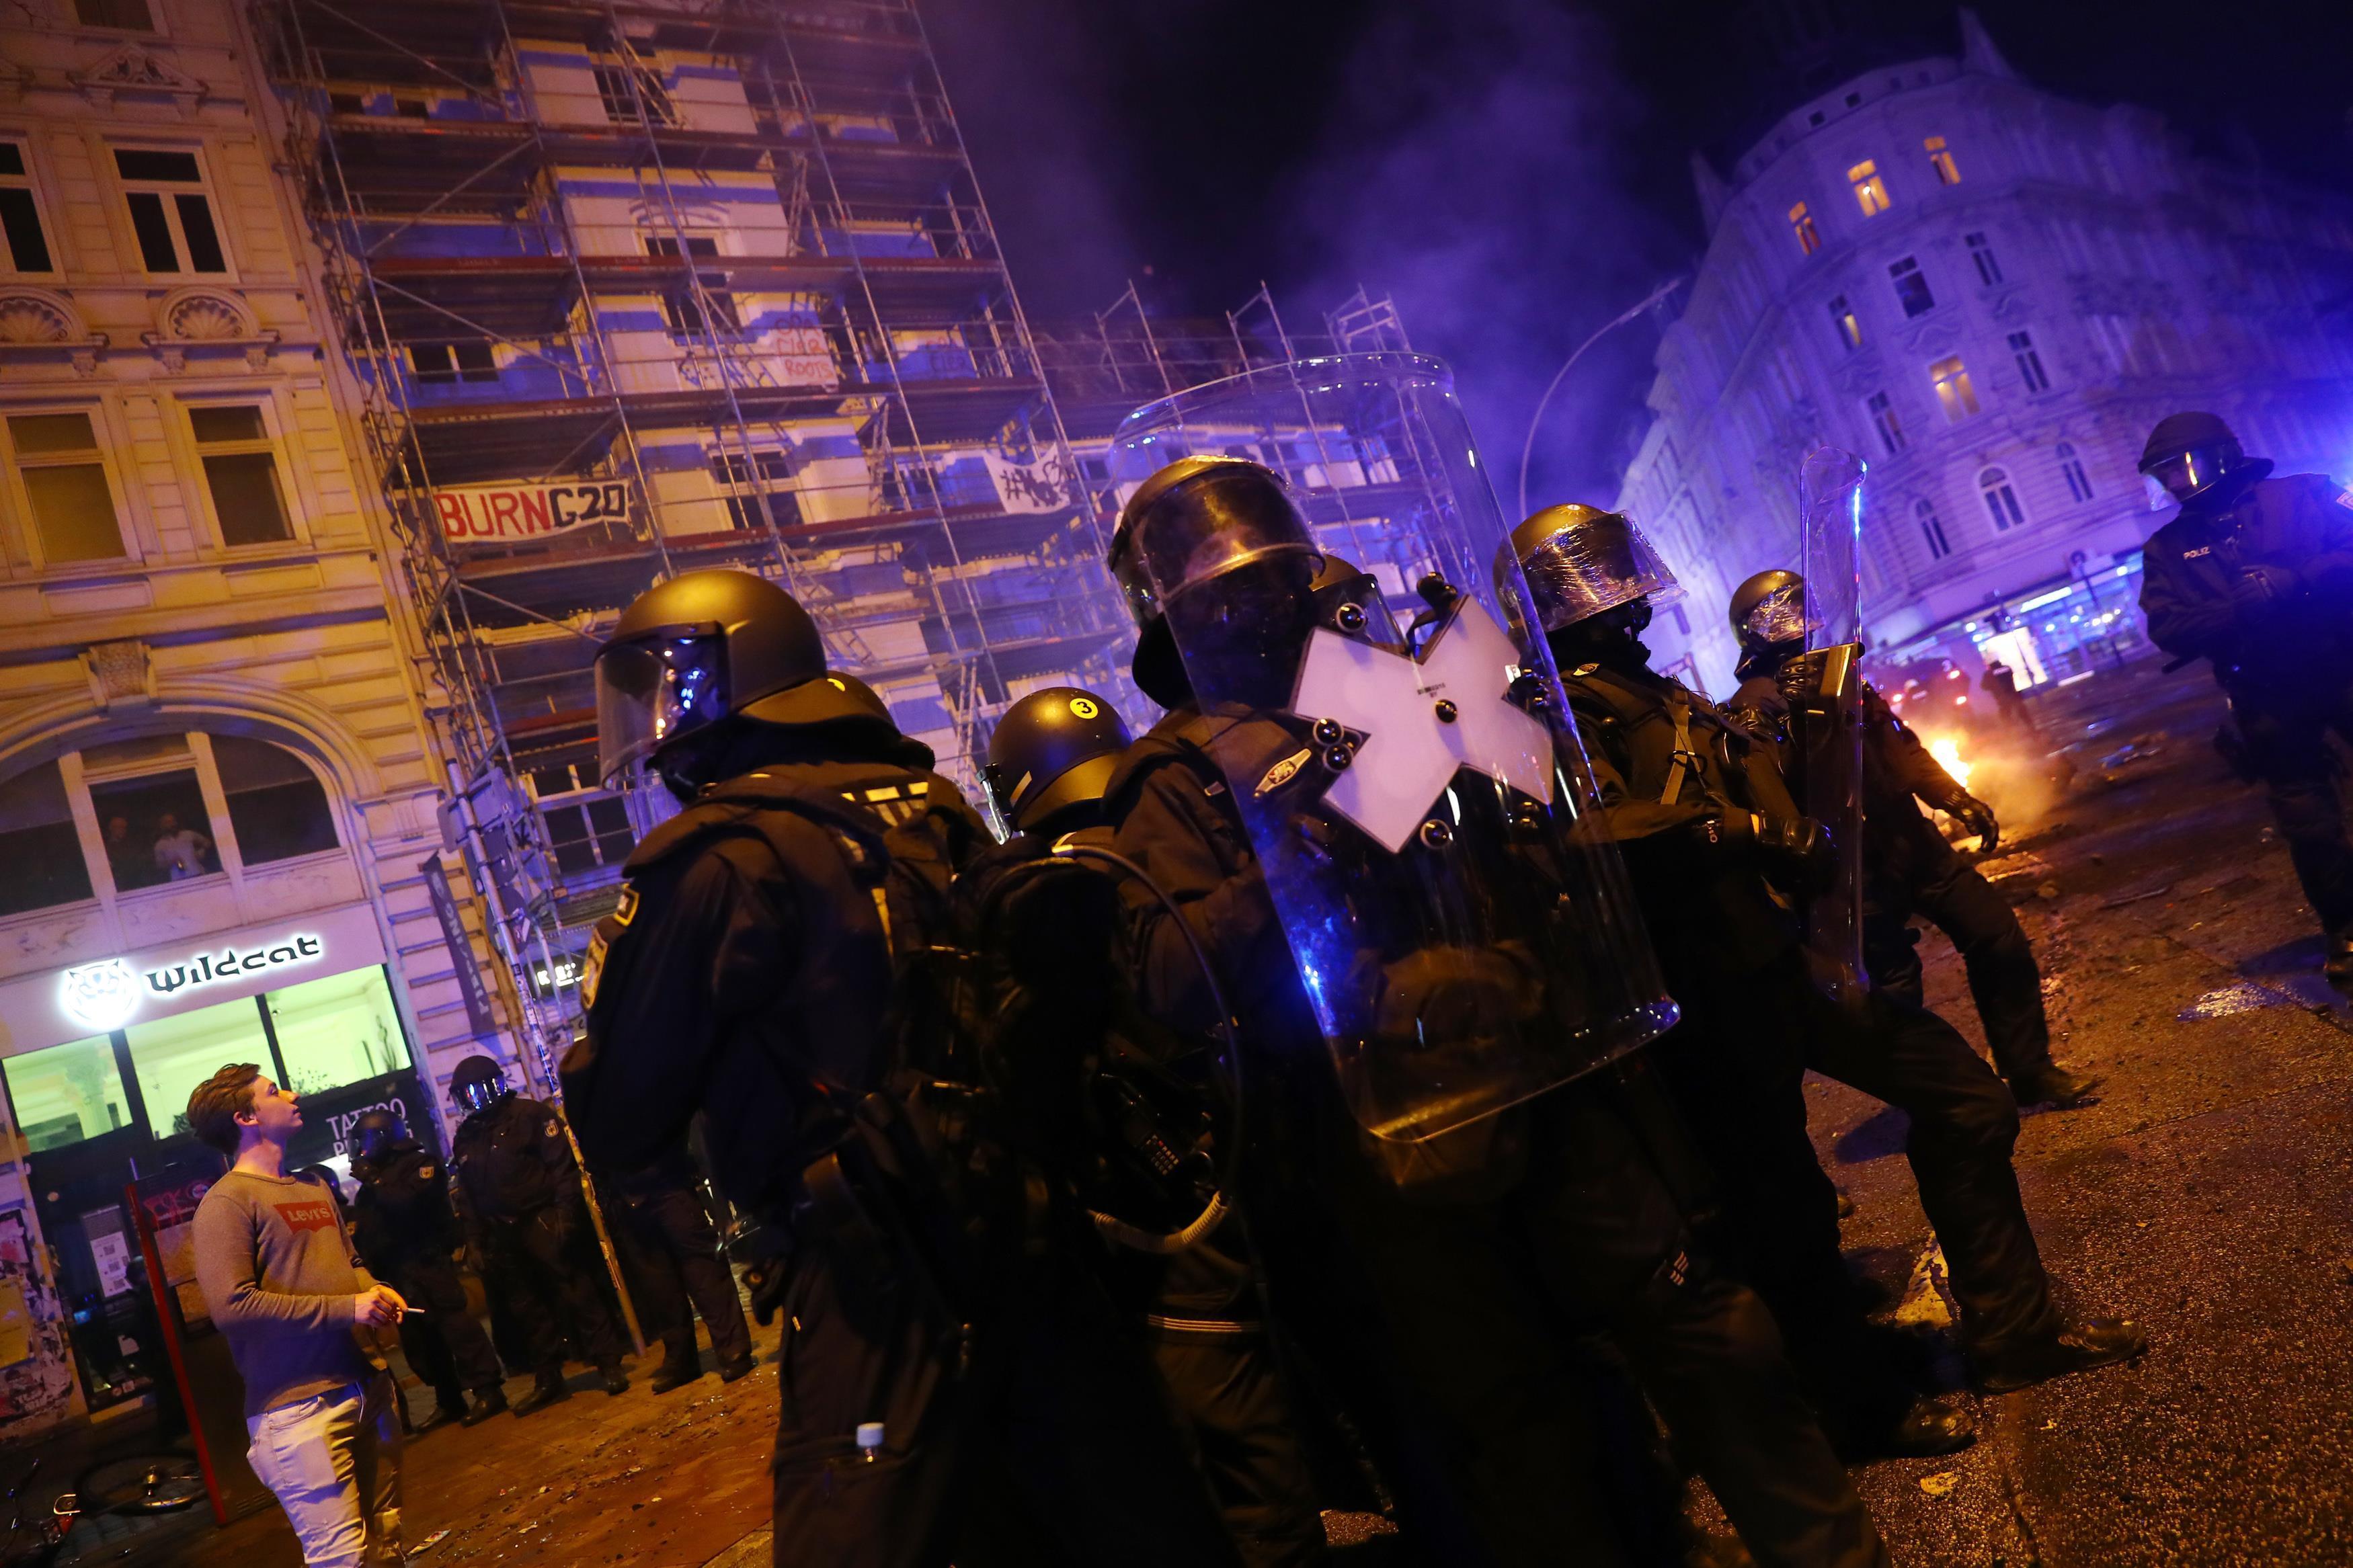 Разруха в Гамбурге: из-за противников G20 пострадали 200 копов. Фоторепортаж